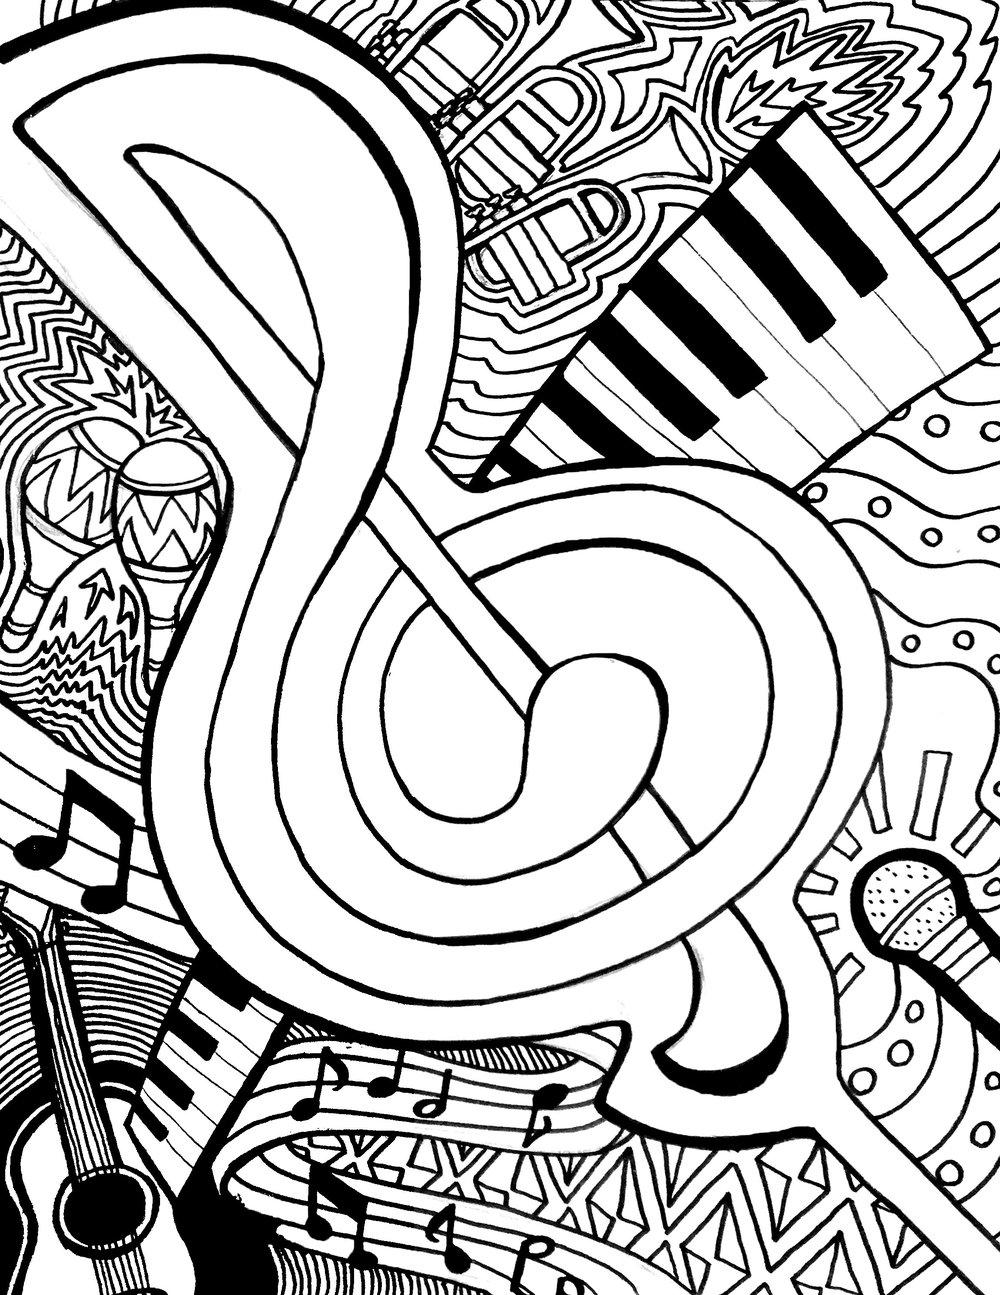 LiveMusicColoringPage.jpg